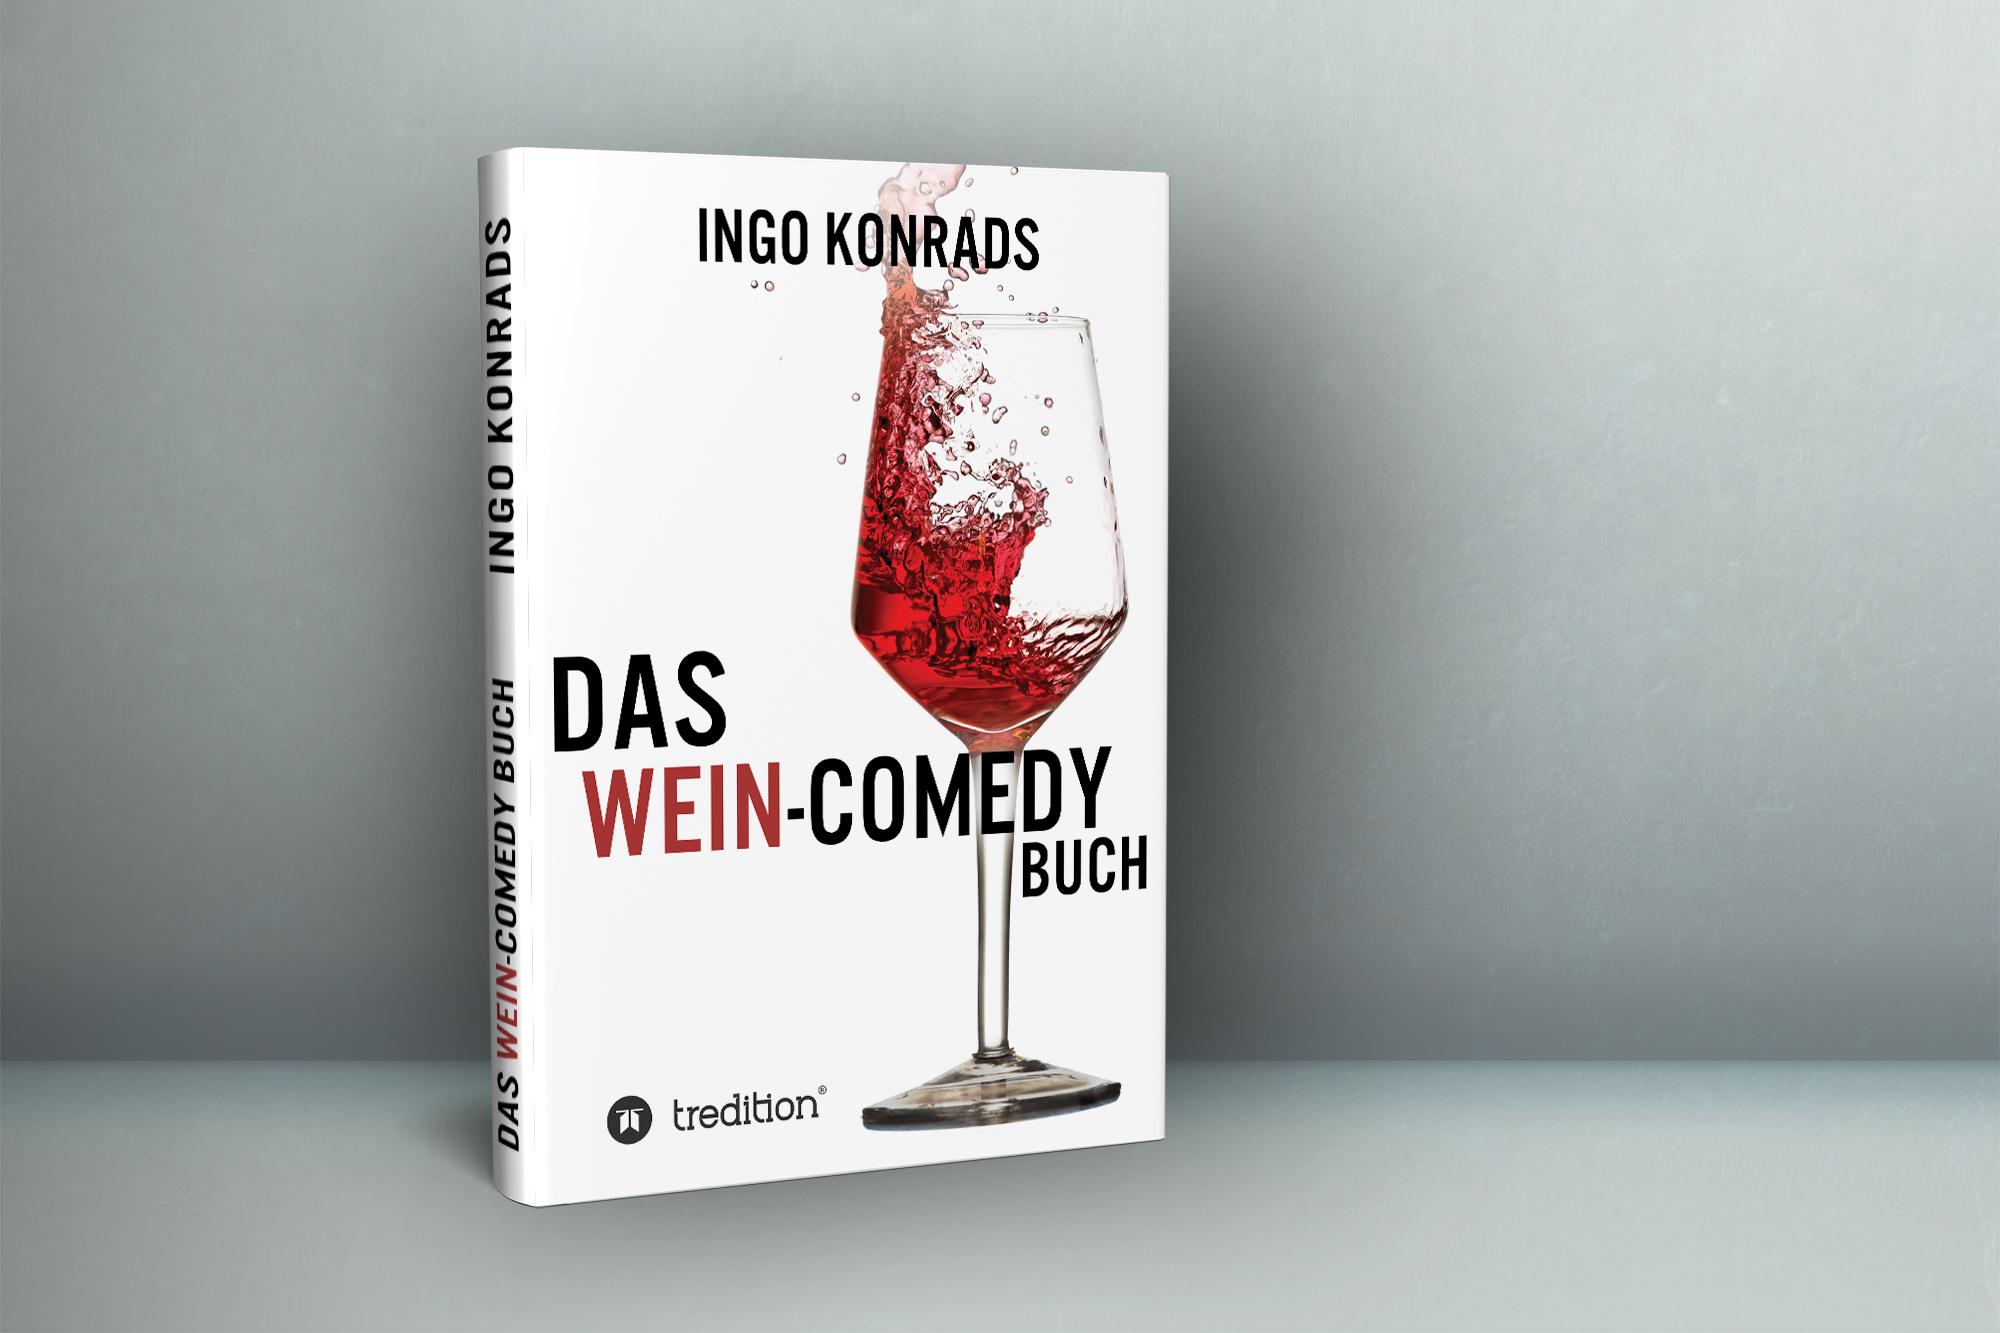 Wein-Comedy Buch